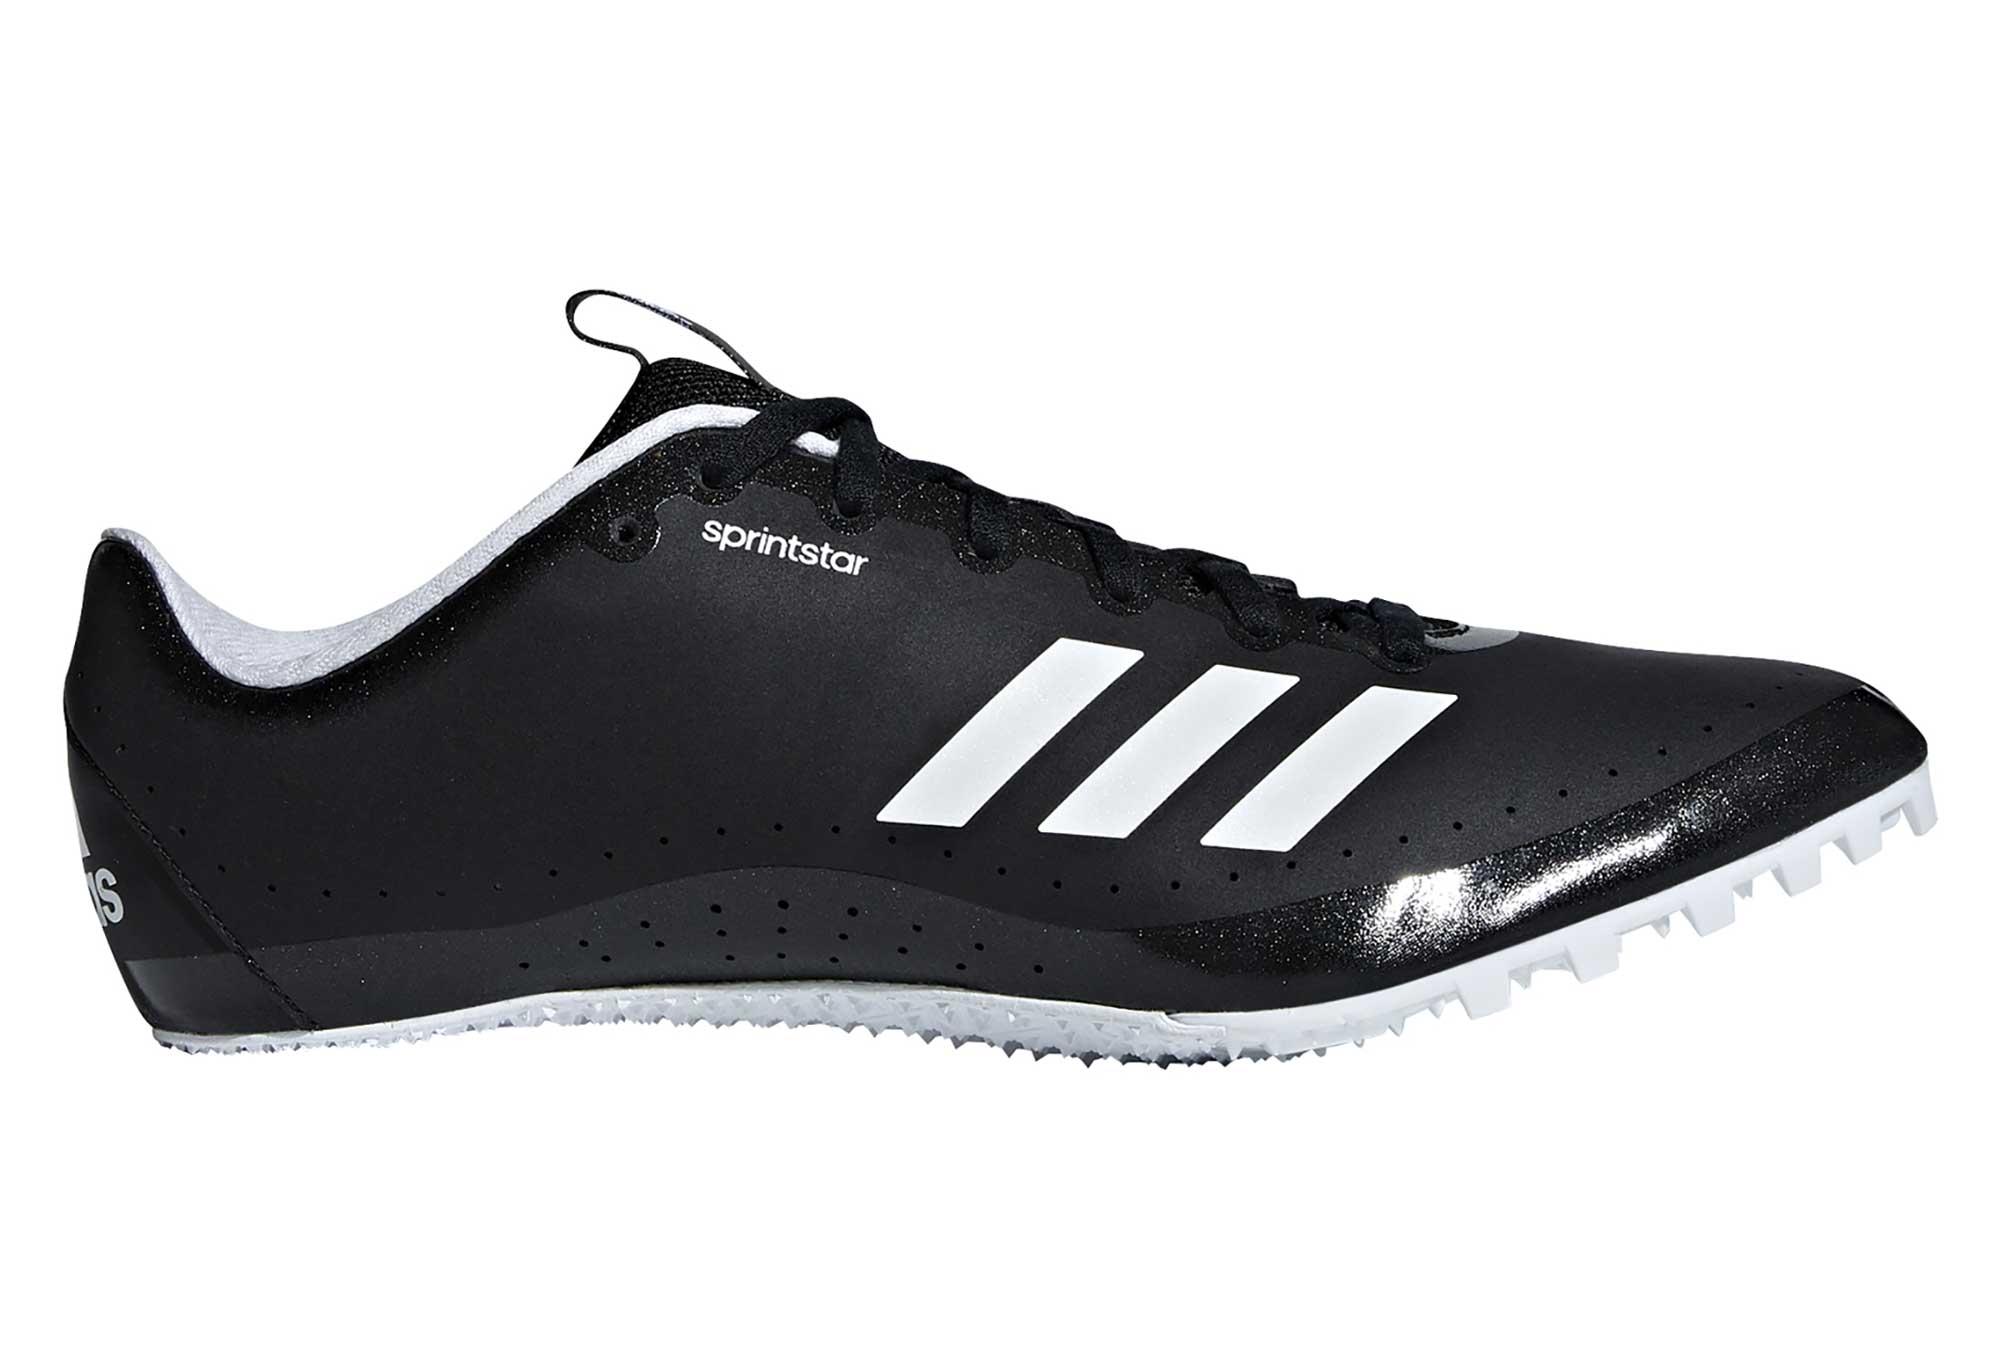 sports shoes 44694 25786 Chaussures dAthlétisme adidas running Sprintstar Noir  Blanc